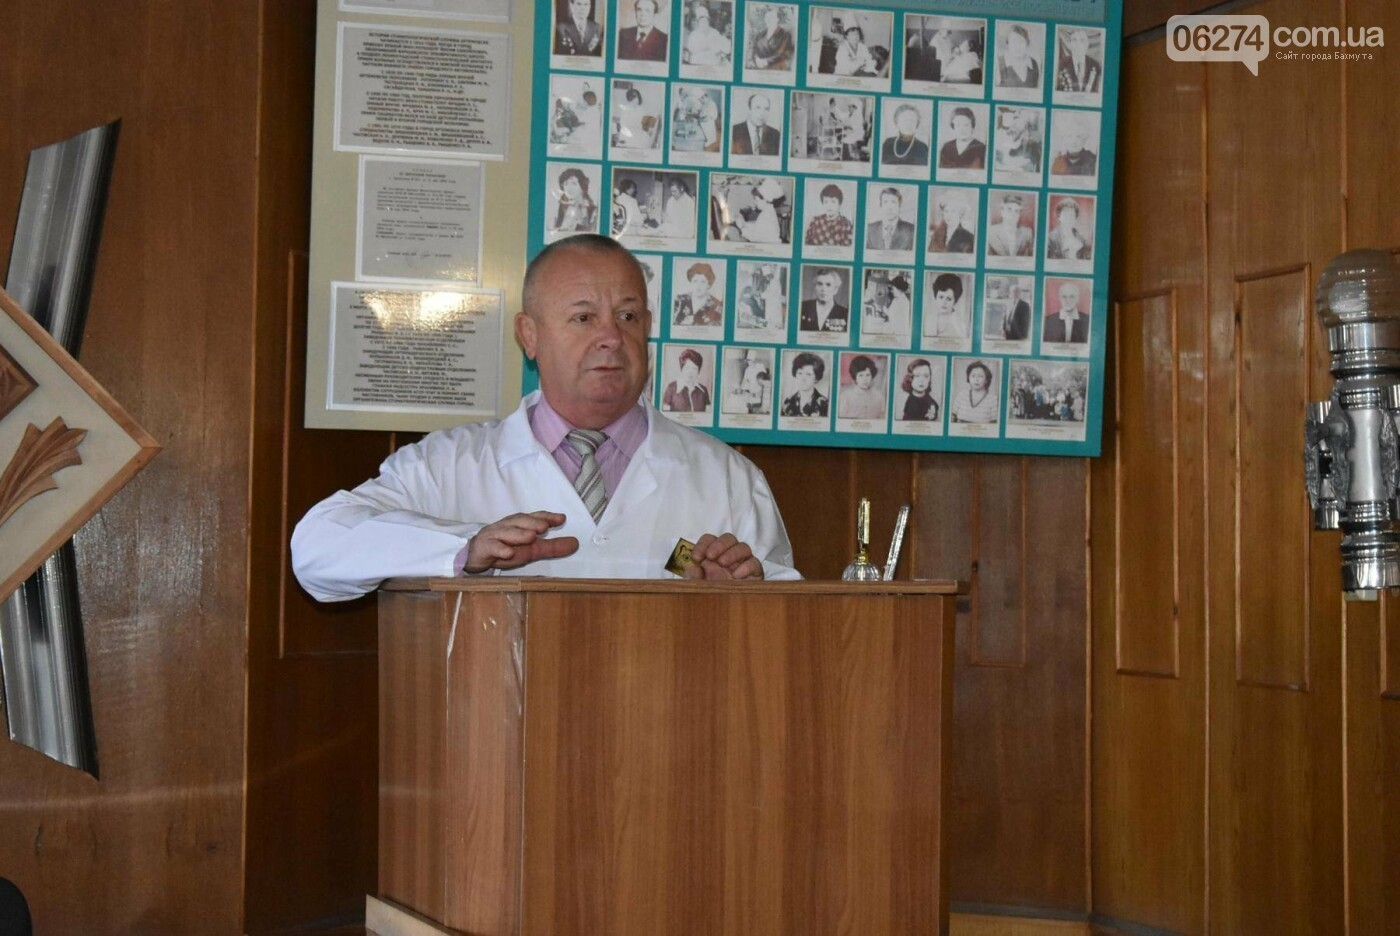 Мэр Бахмута Алексей Рева провел рабочую встречу с коллективом стоматполиклиники, фото-3